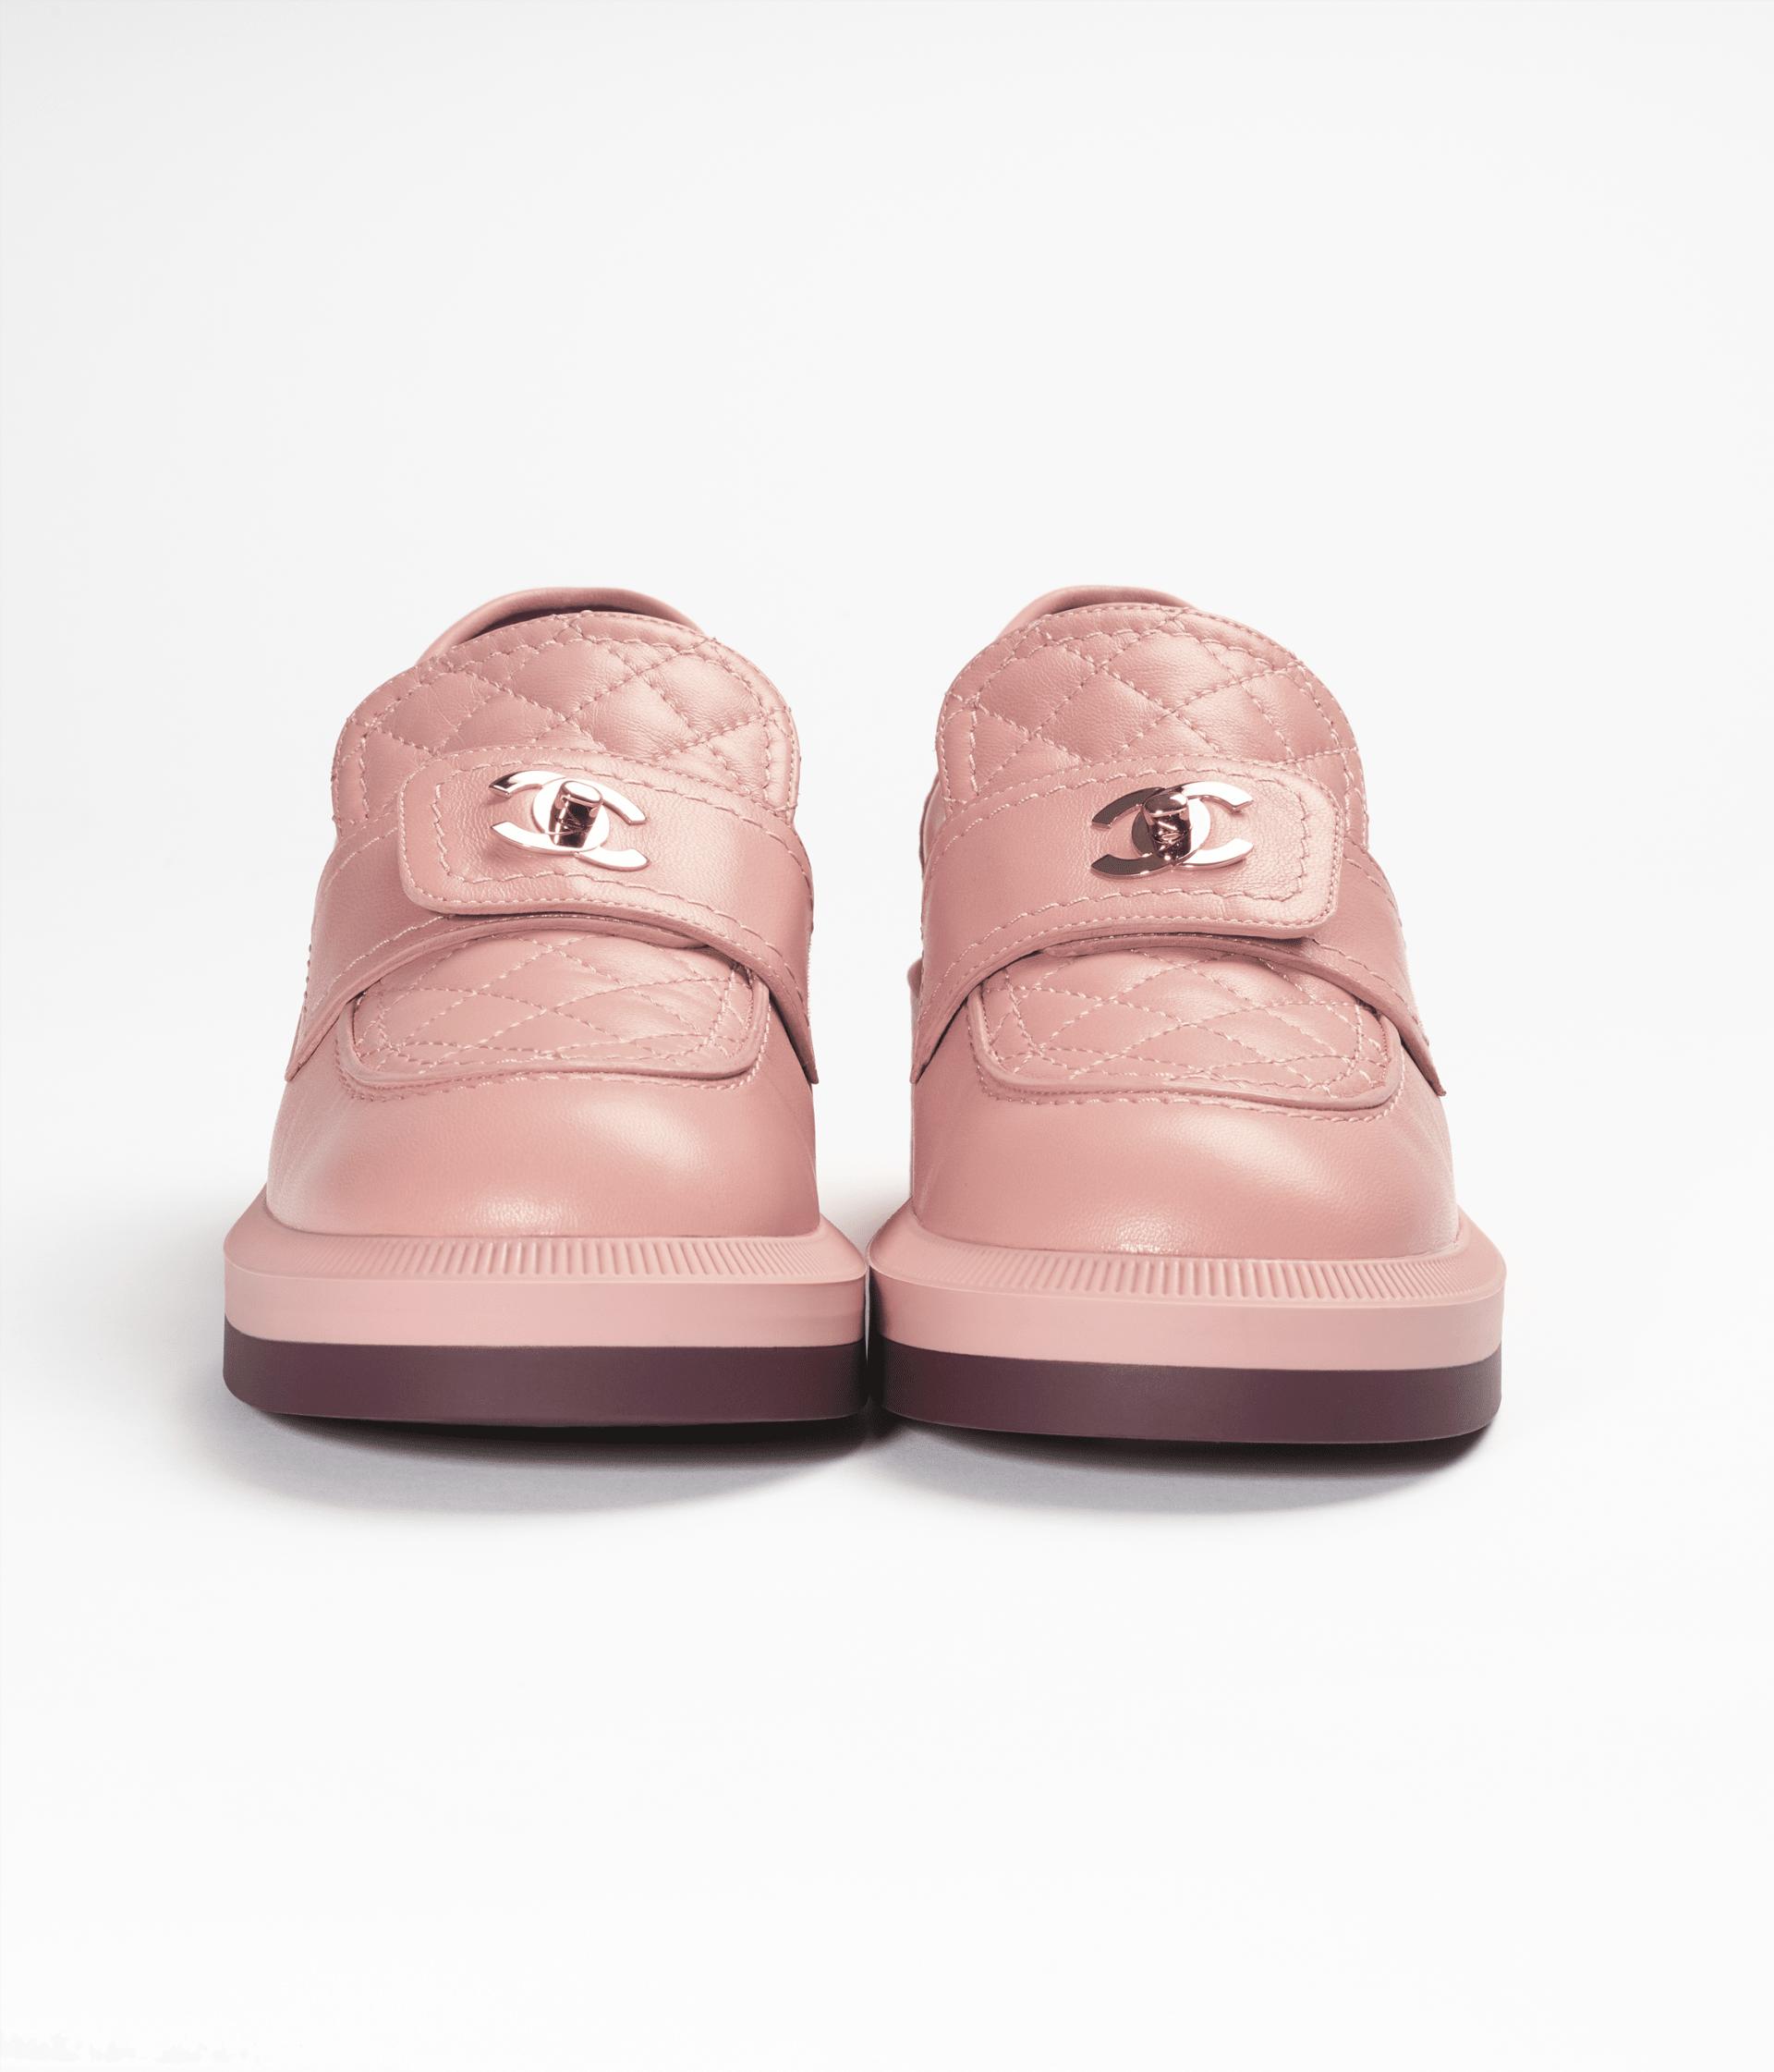 image 3 - Loafers - Lambskin - Dark Pink